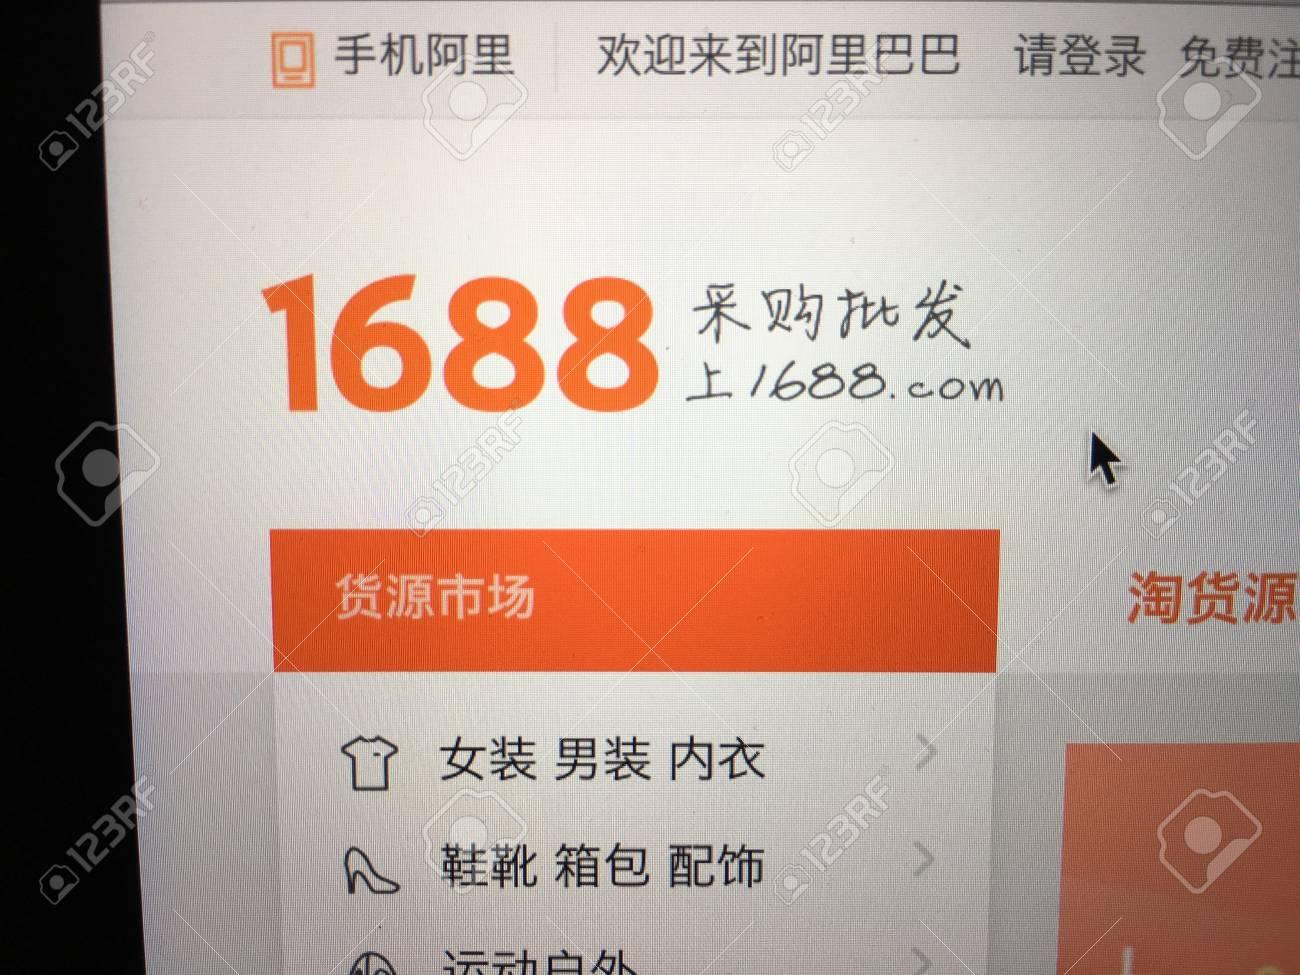 Wuhan China, 7 October 2017: 1688 com chinese version of Alibaba